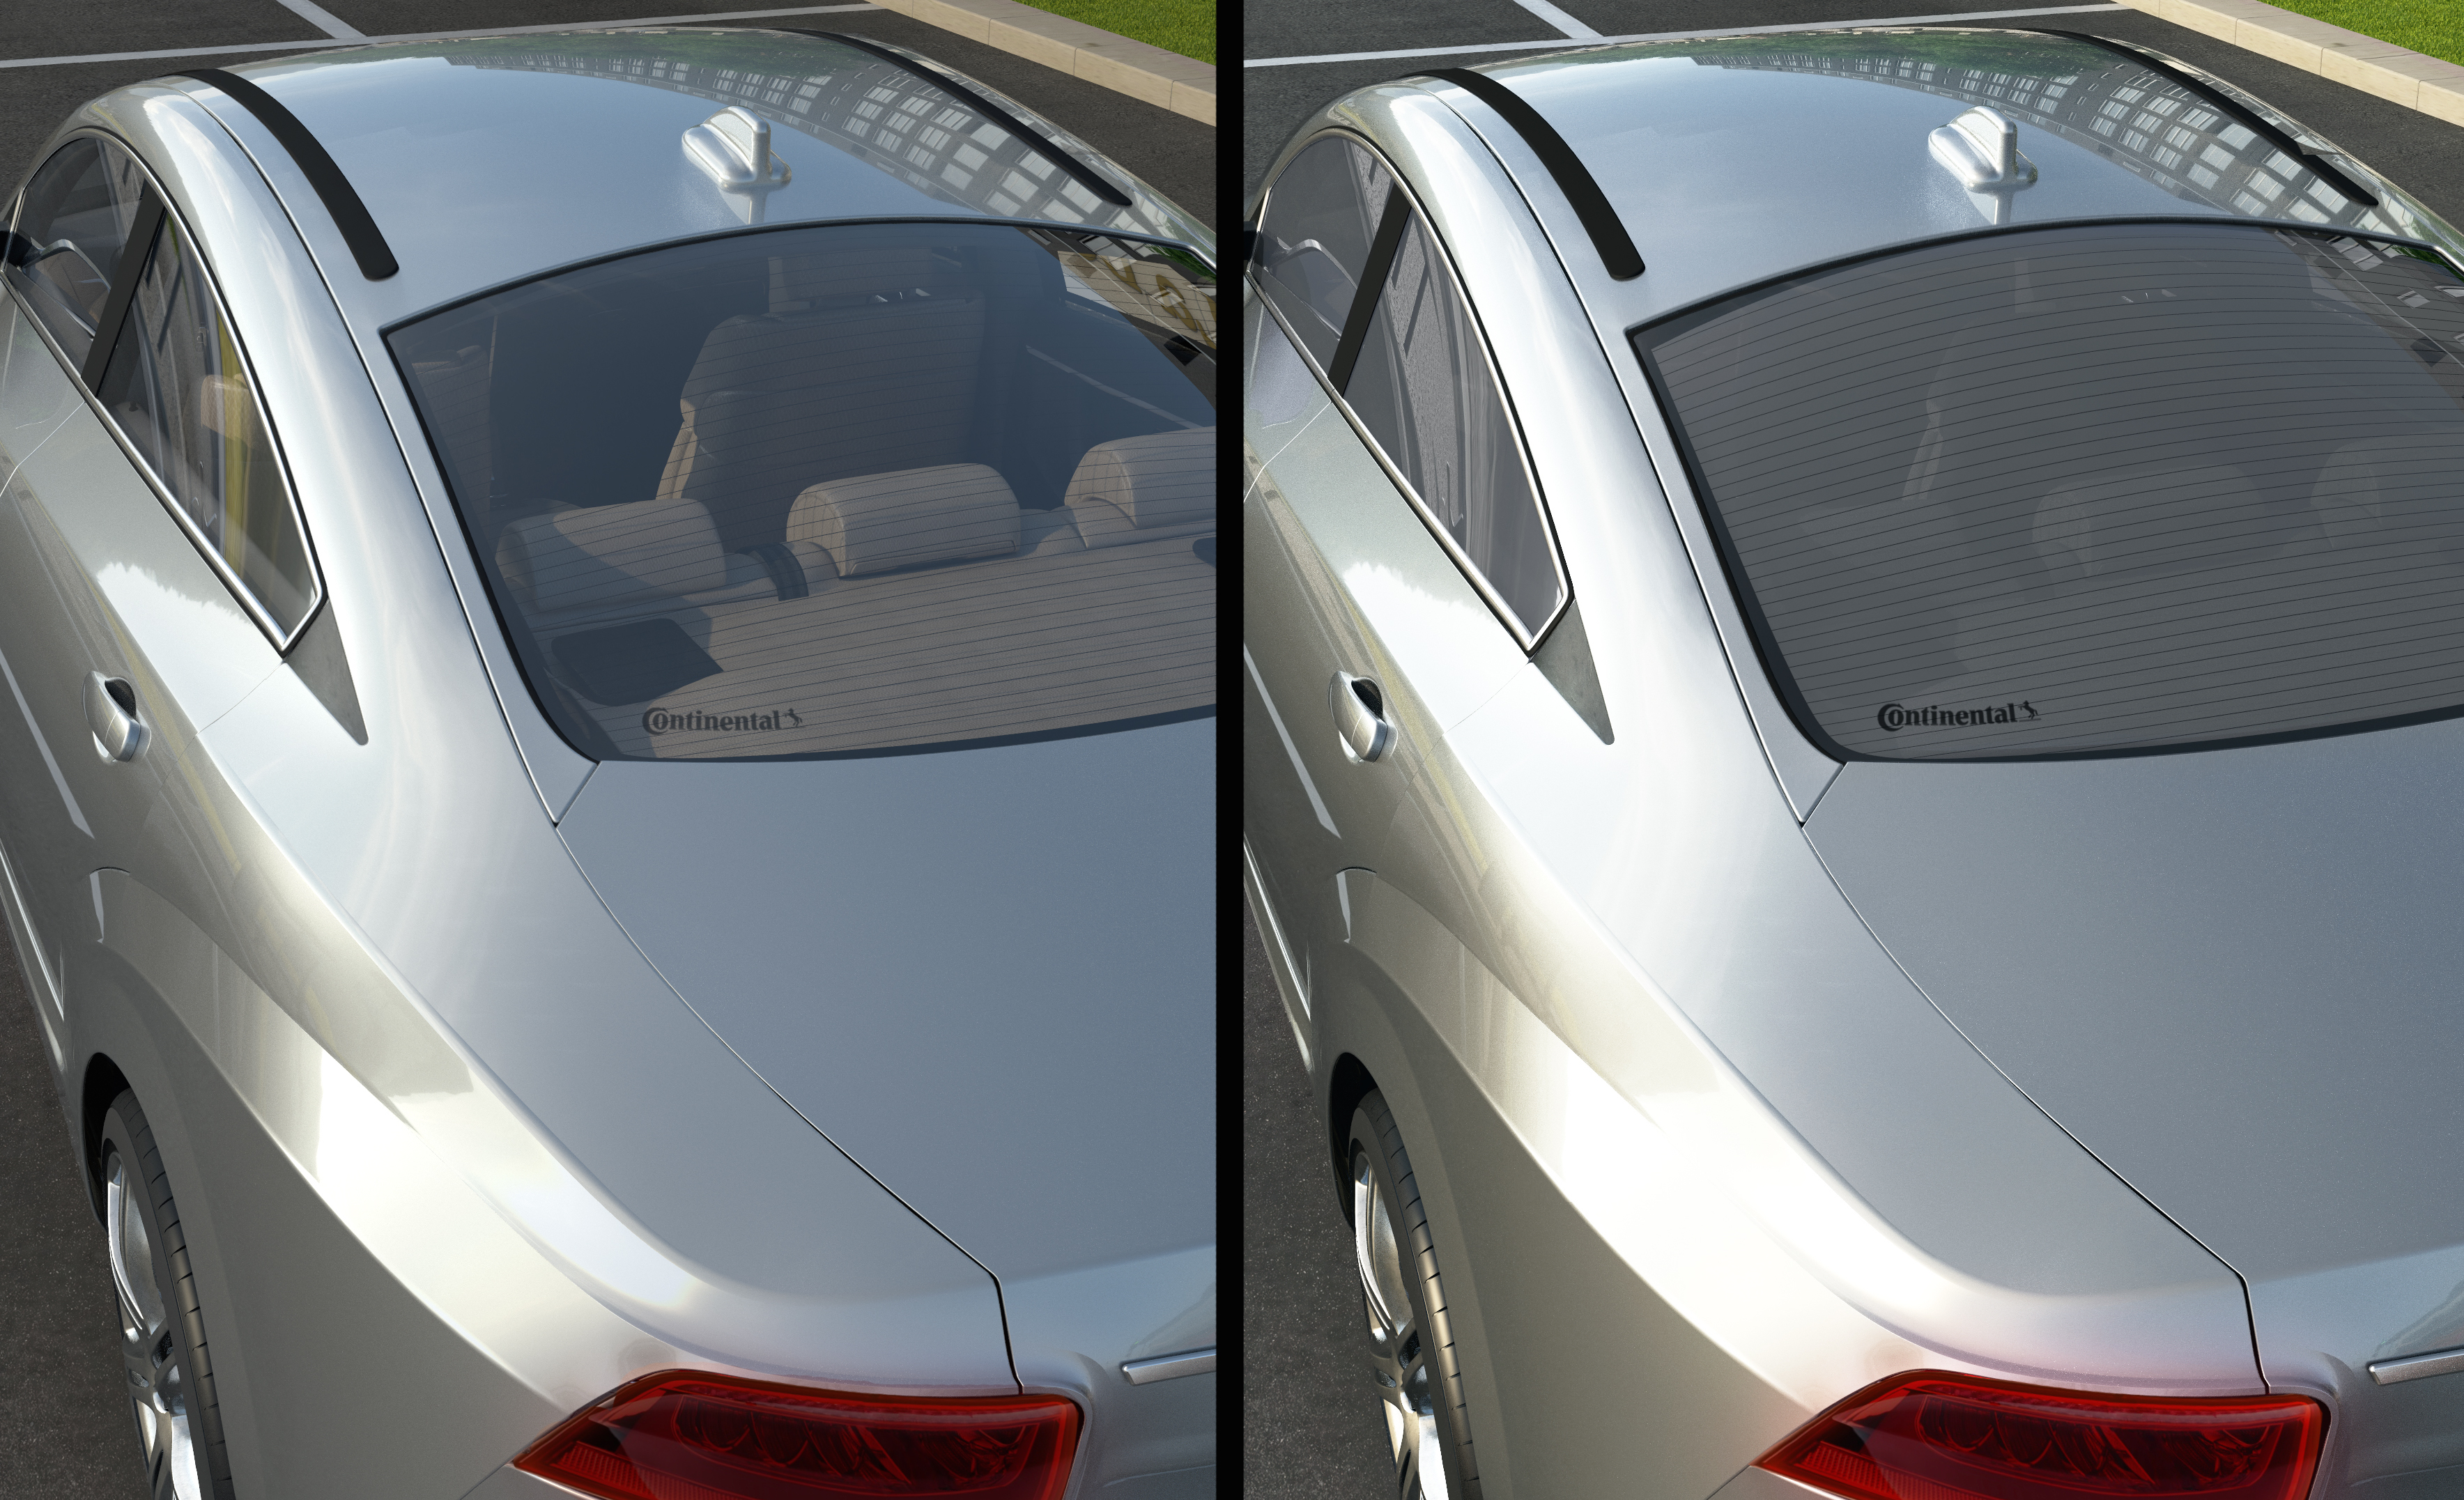 Continental Intelligent Glass Control Auto Window Tint